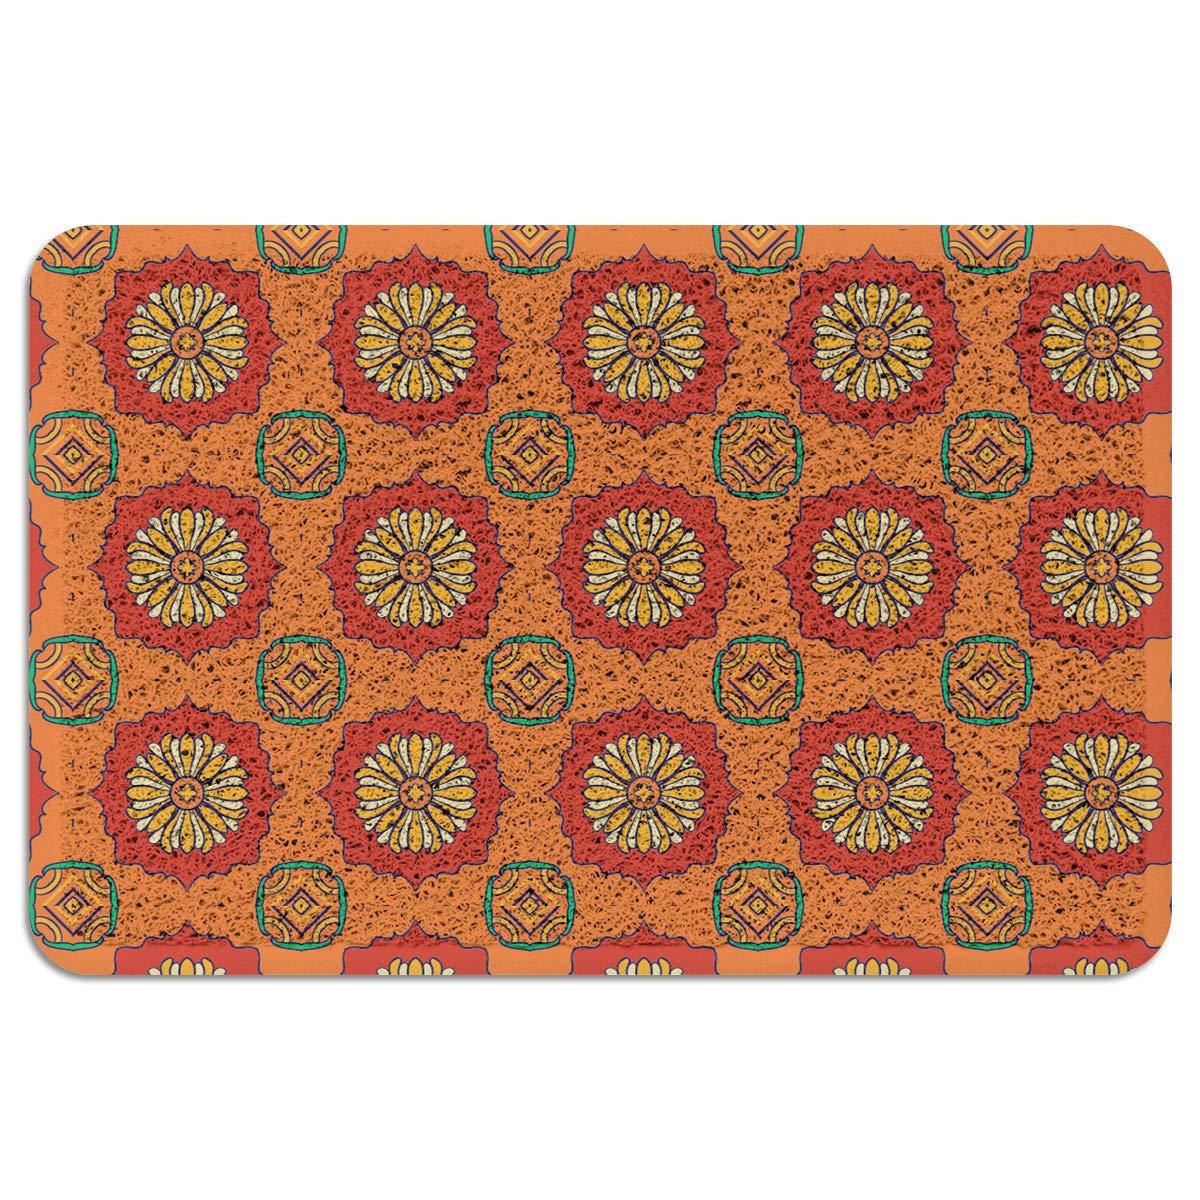 Indoor/Outdoor Doormat,Floral Durable Heavy Duty Shoes Scraper Mat, Ethnic Geometric Warm Color Easy Clean Rug for Pet Bowl(24''x35'',W x L)